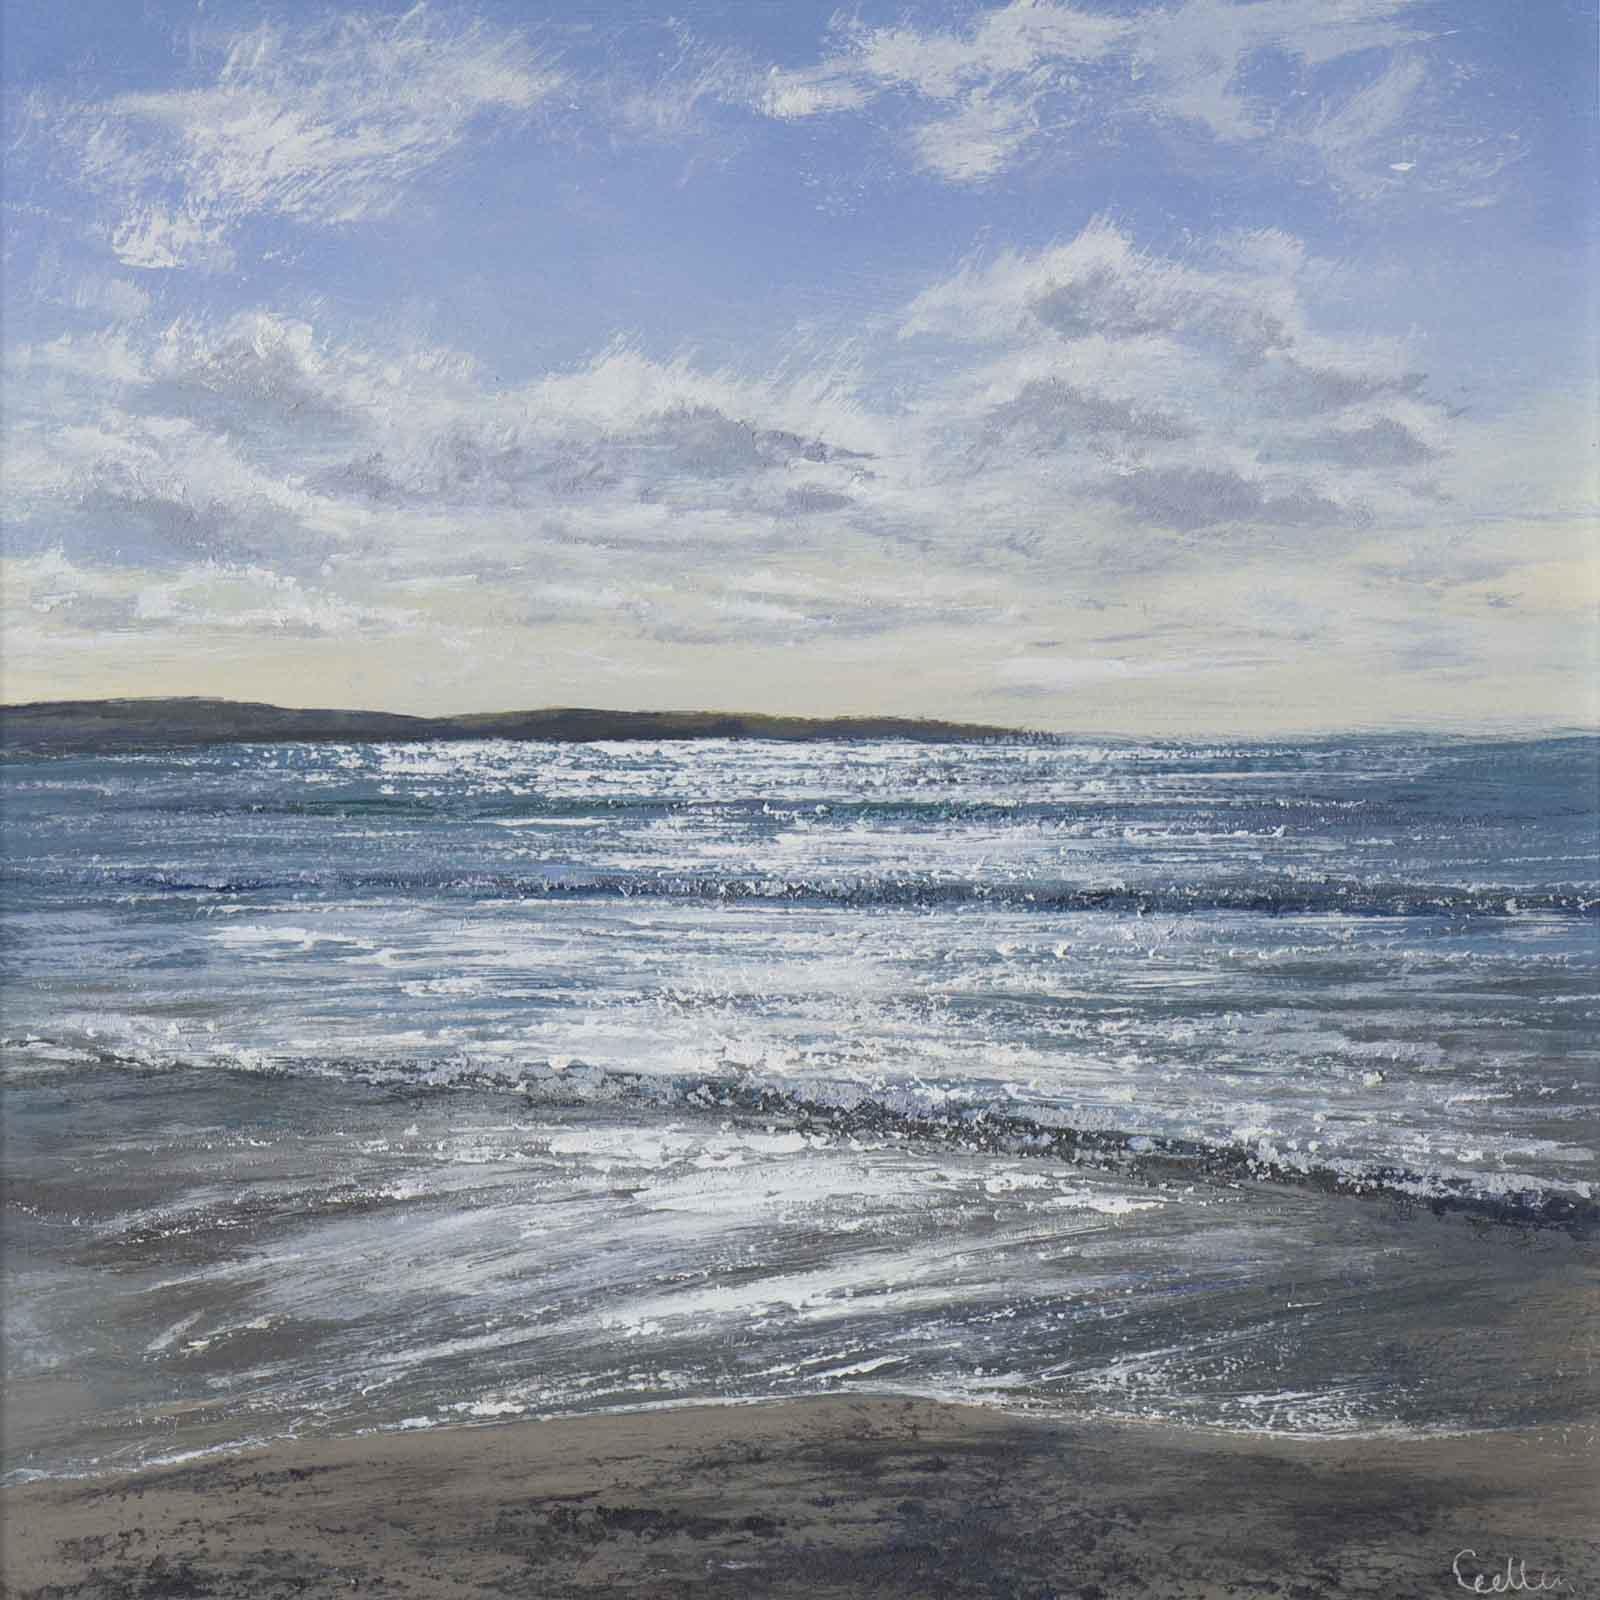 Sea Shine, Gwithian